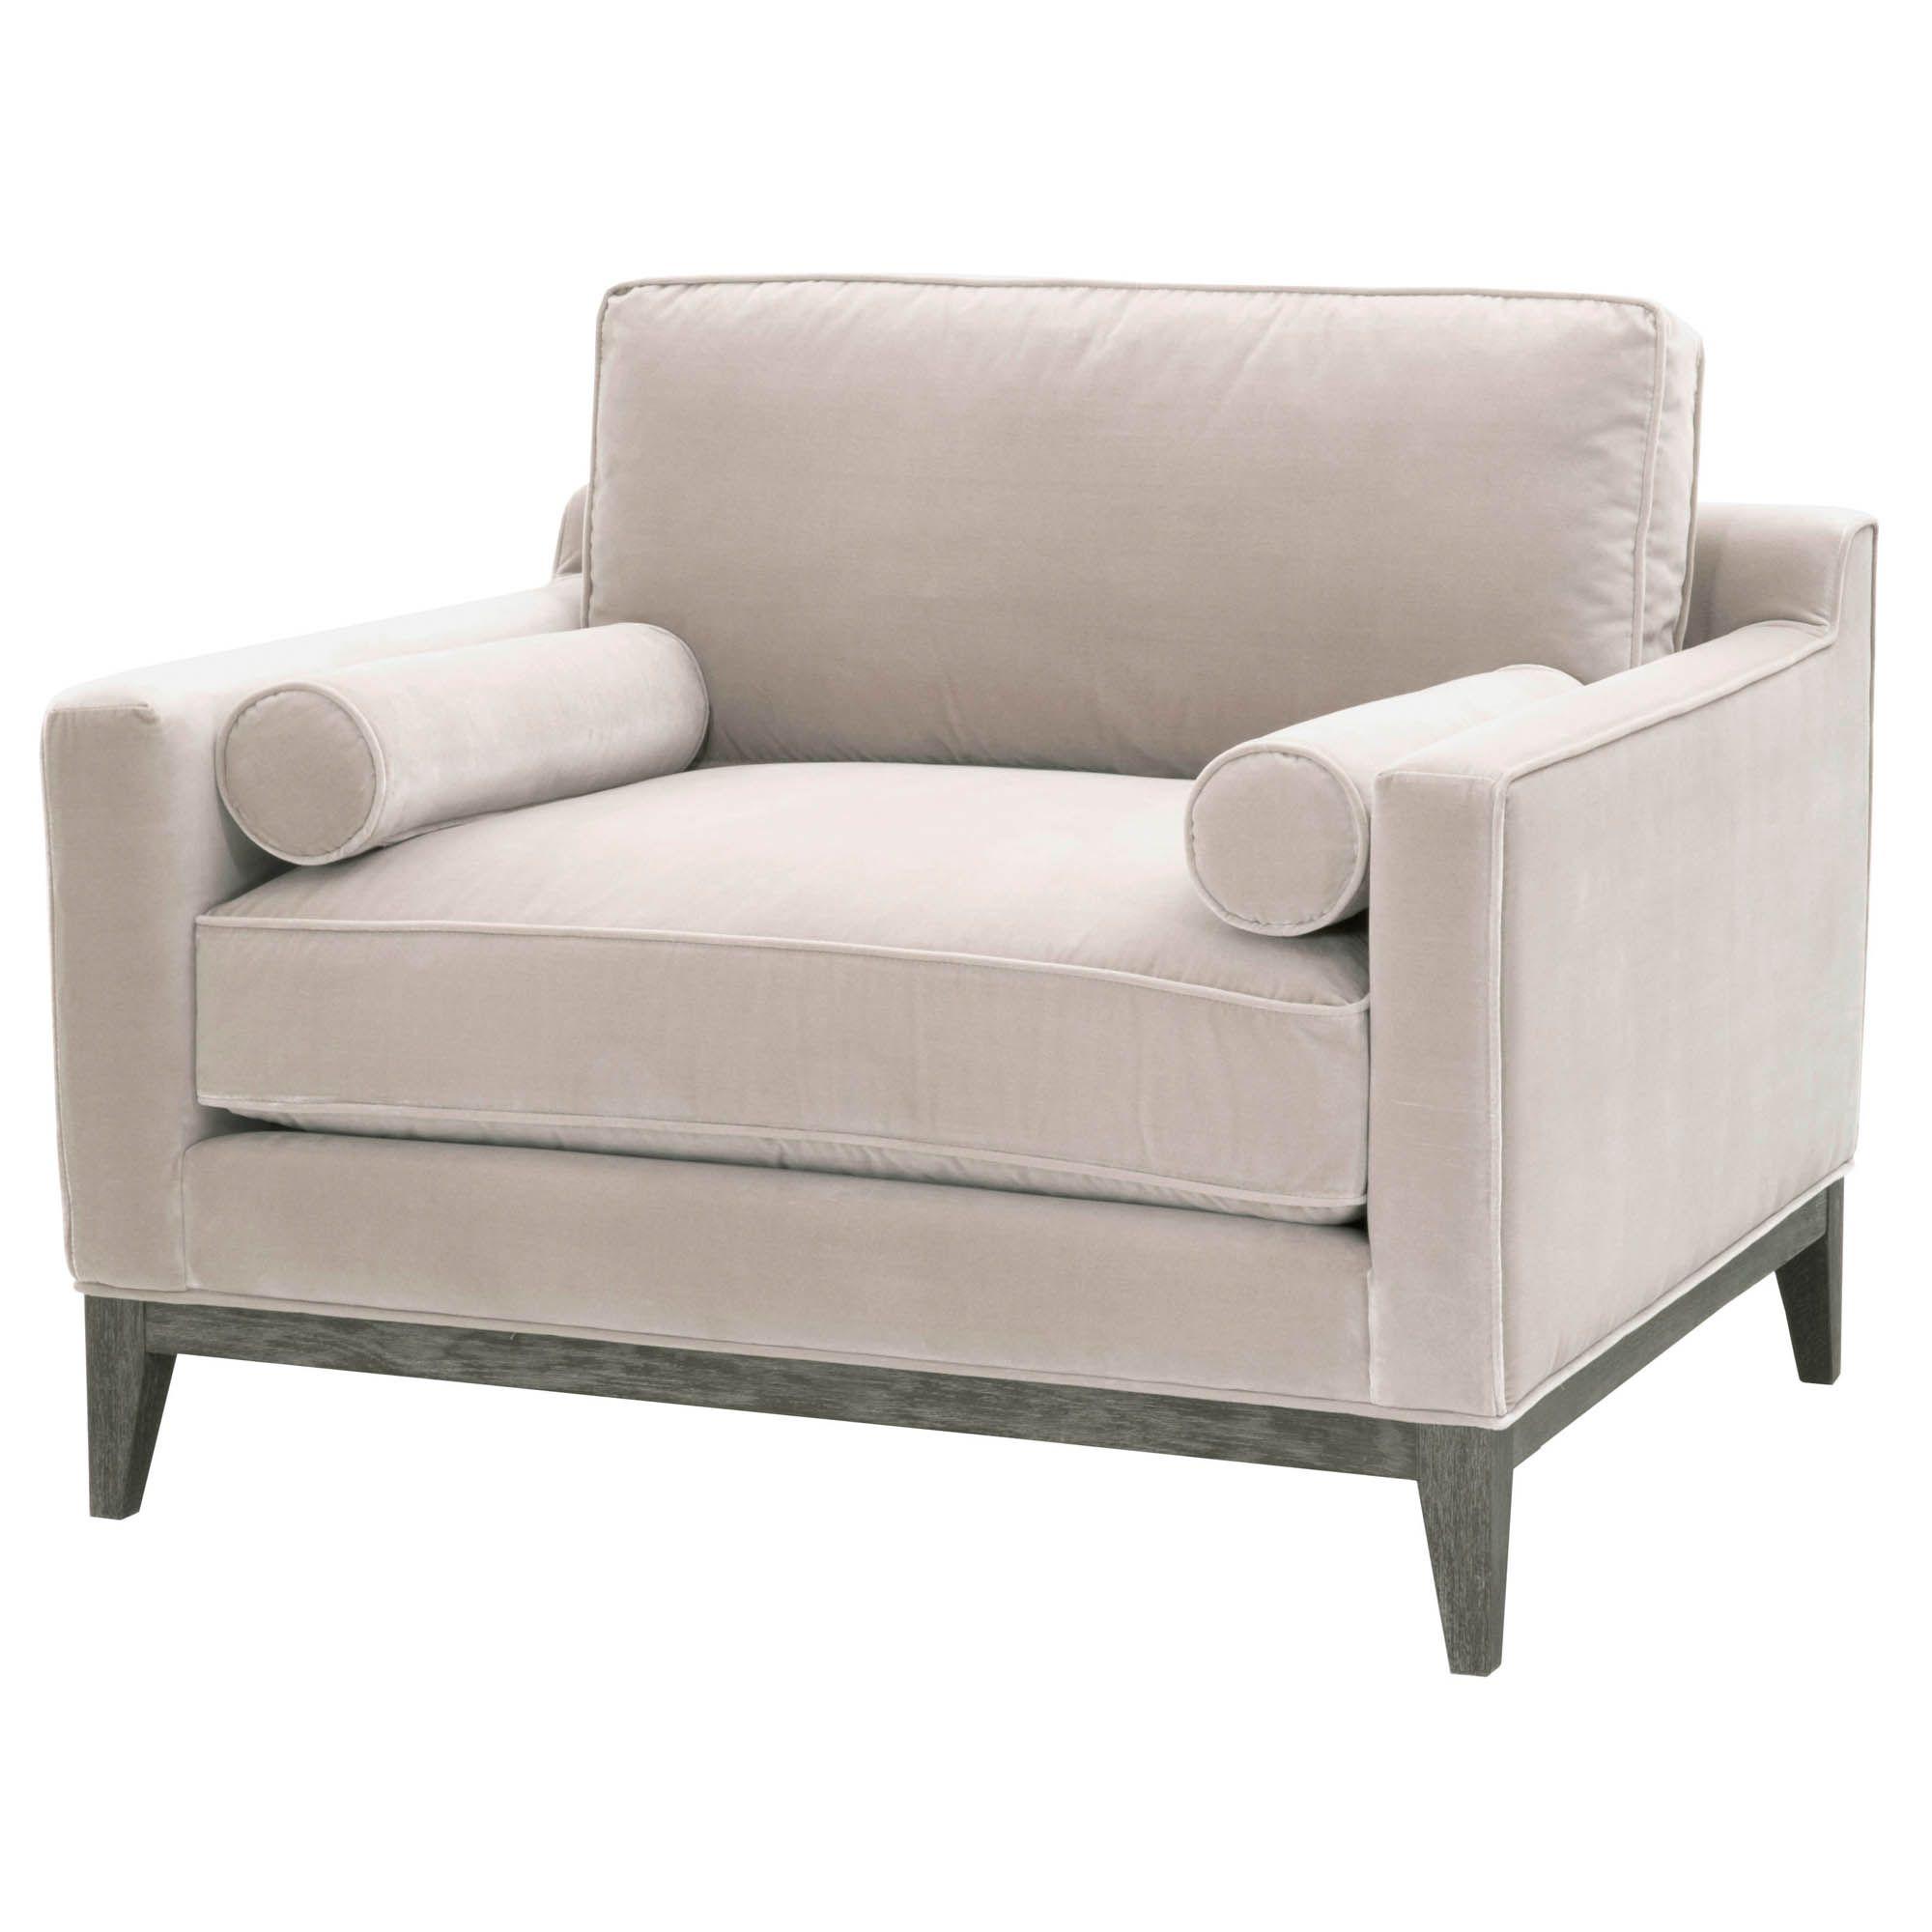 Parker Post Modern Sofa Chair 이미지 포함 가구